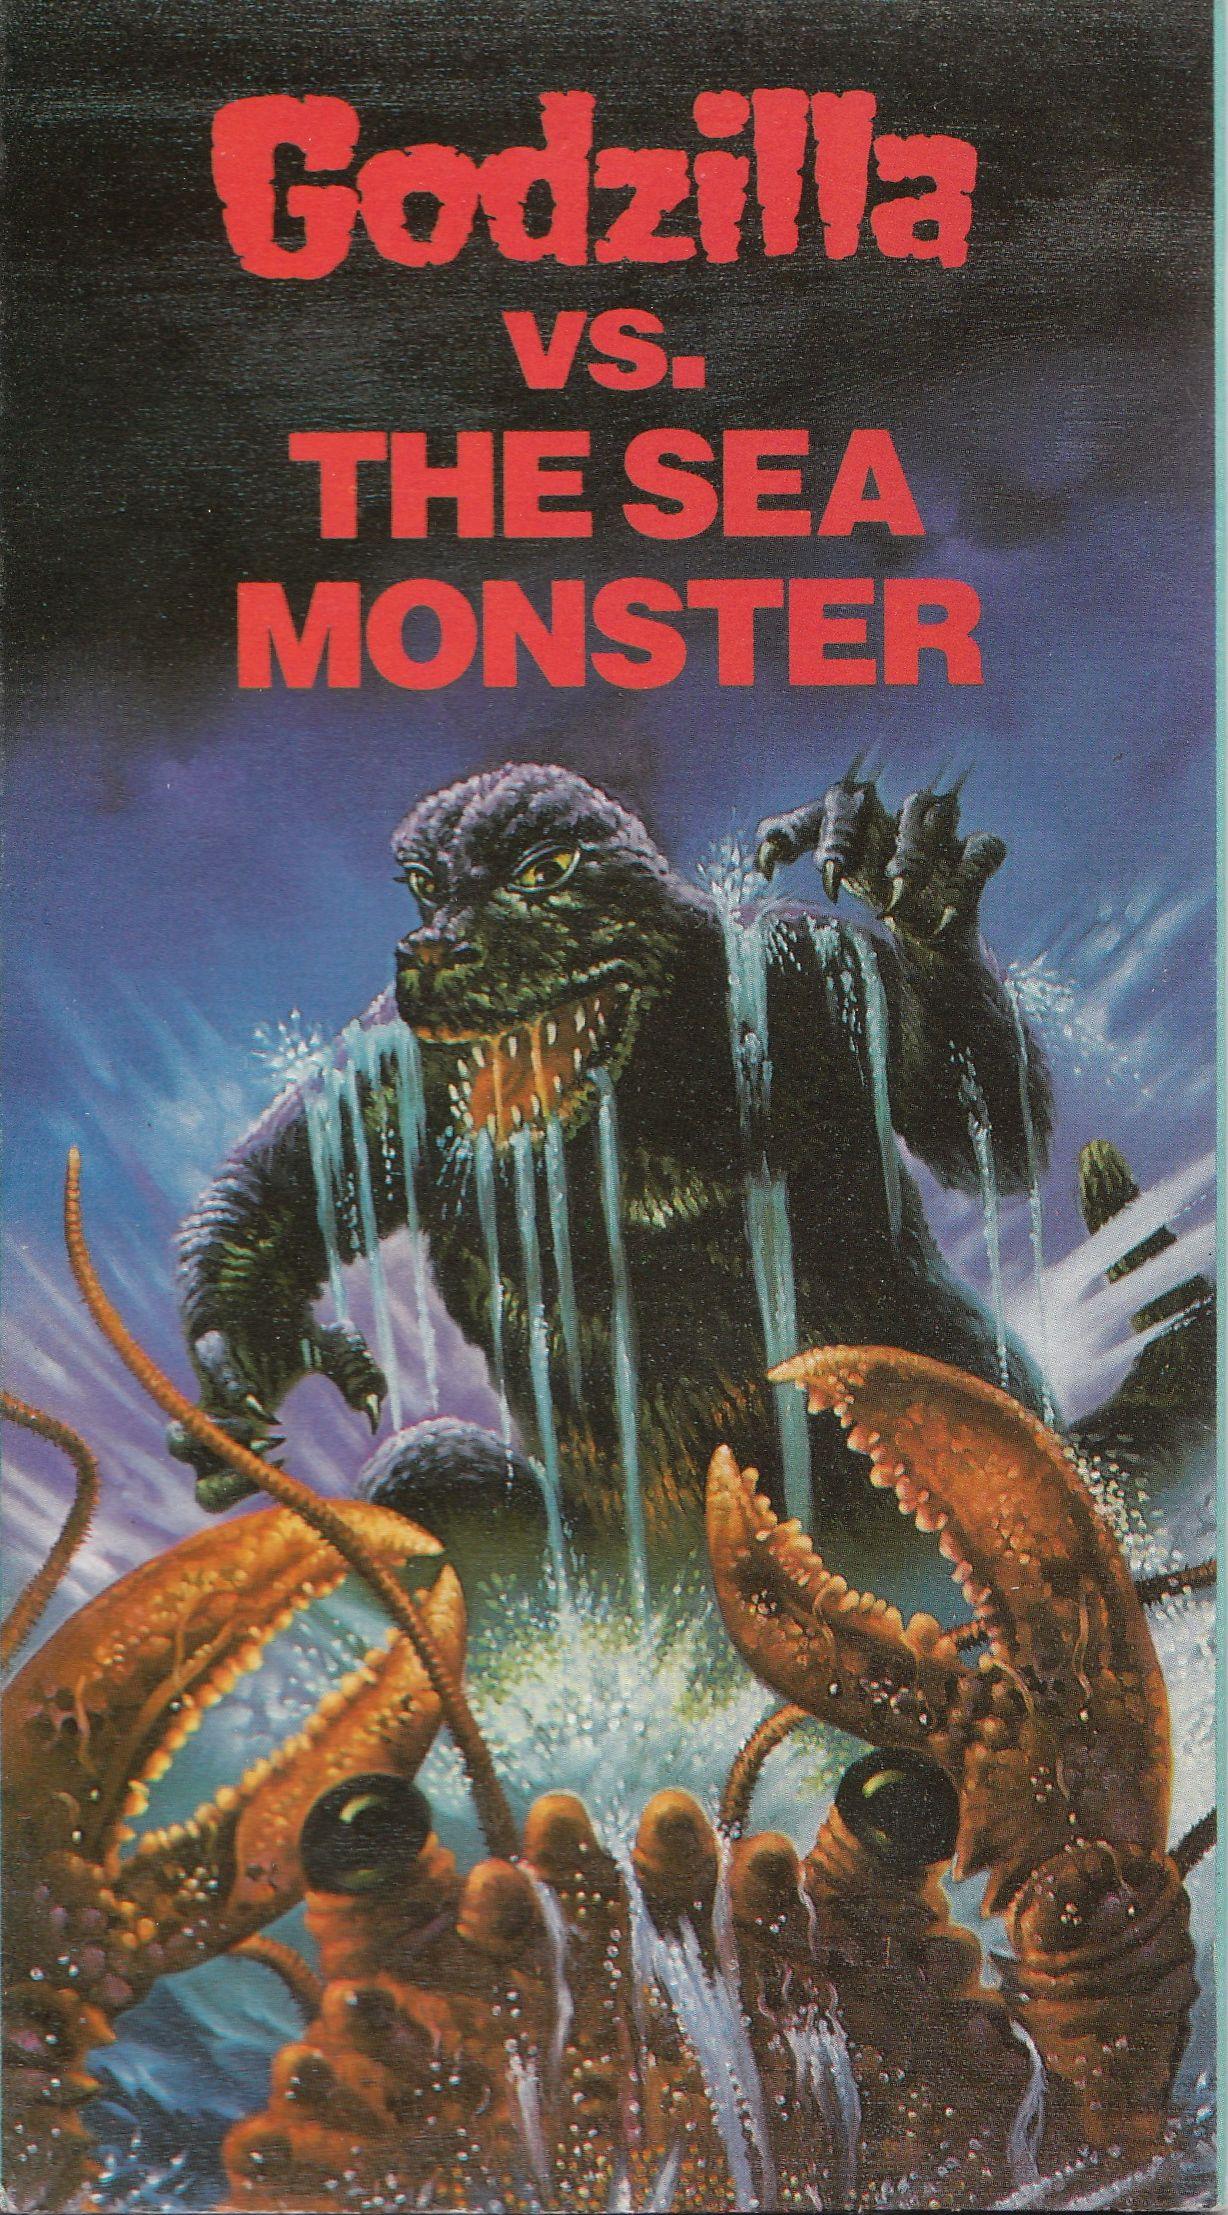 Godzilla Vs. The Sea Monster 6